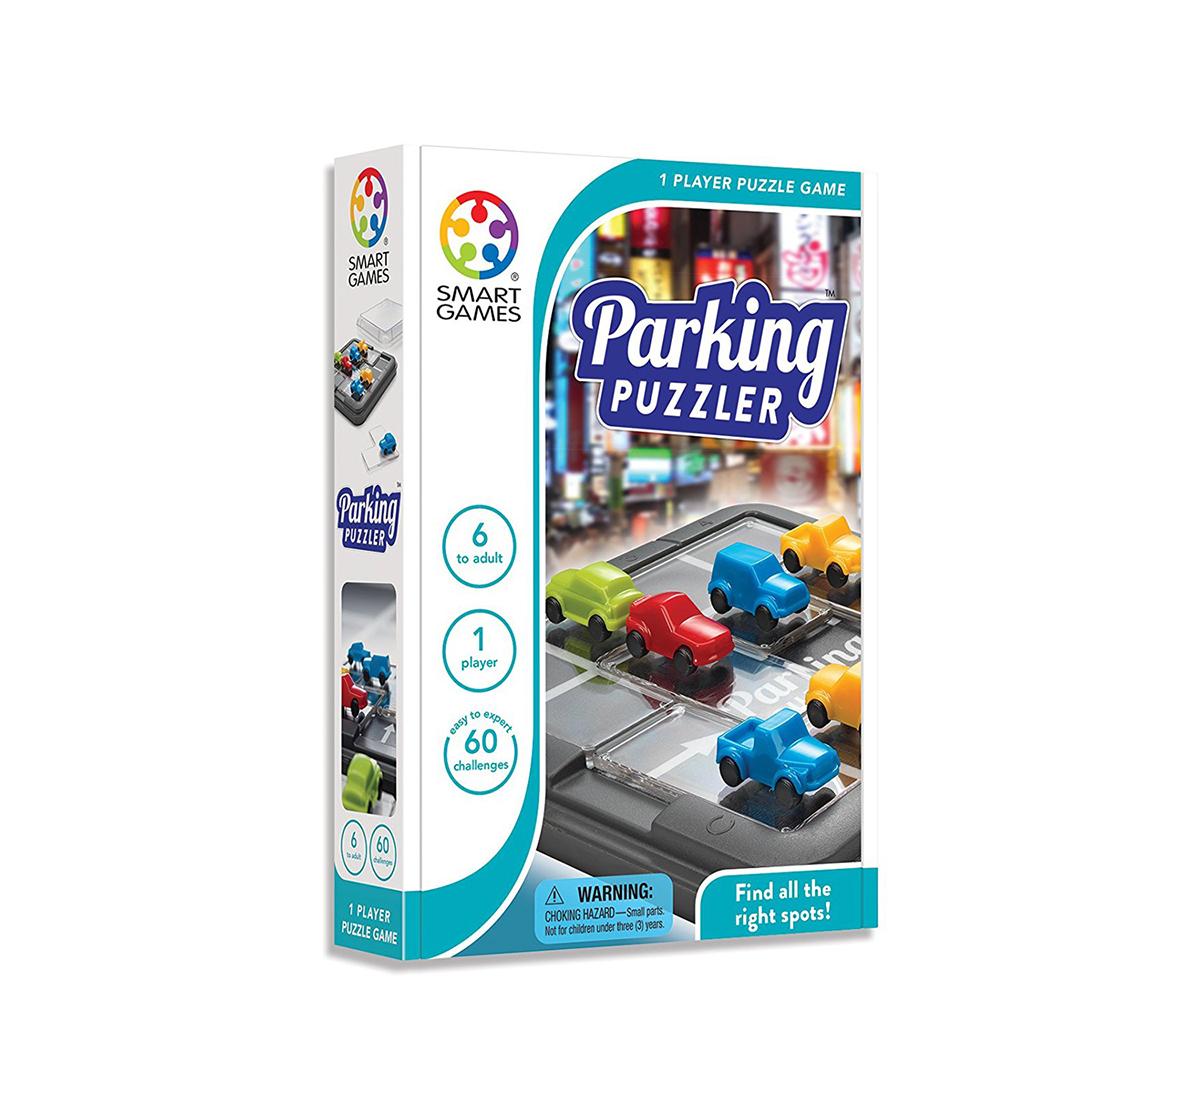 Smart Games | Smart Games Parking Puzzler for Kids age 6Y+